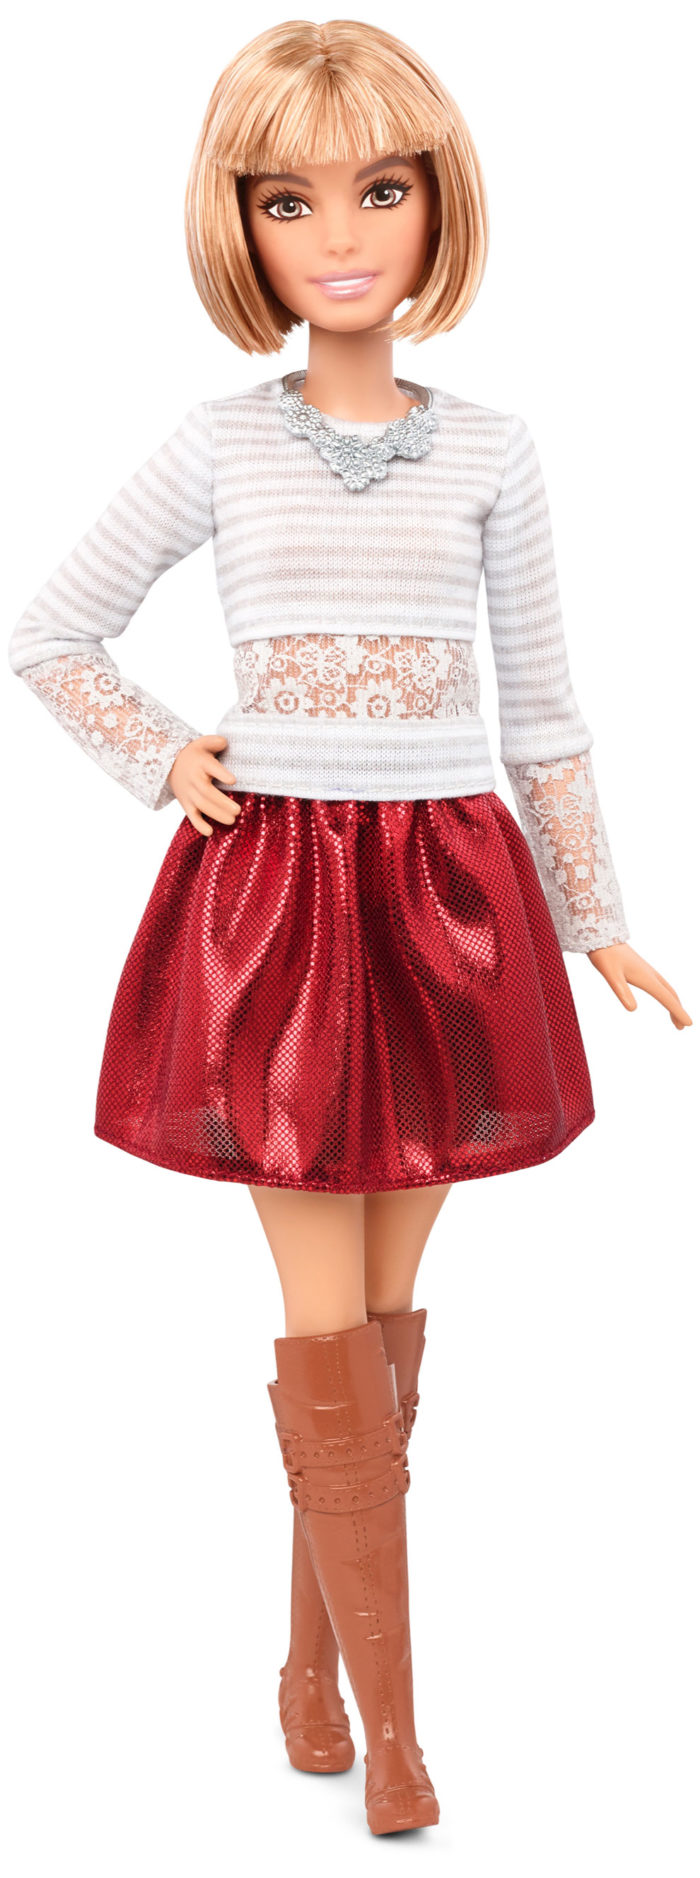 barbie-nuove-curvy-bassa-alta-realistica-13